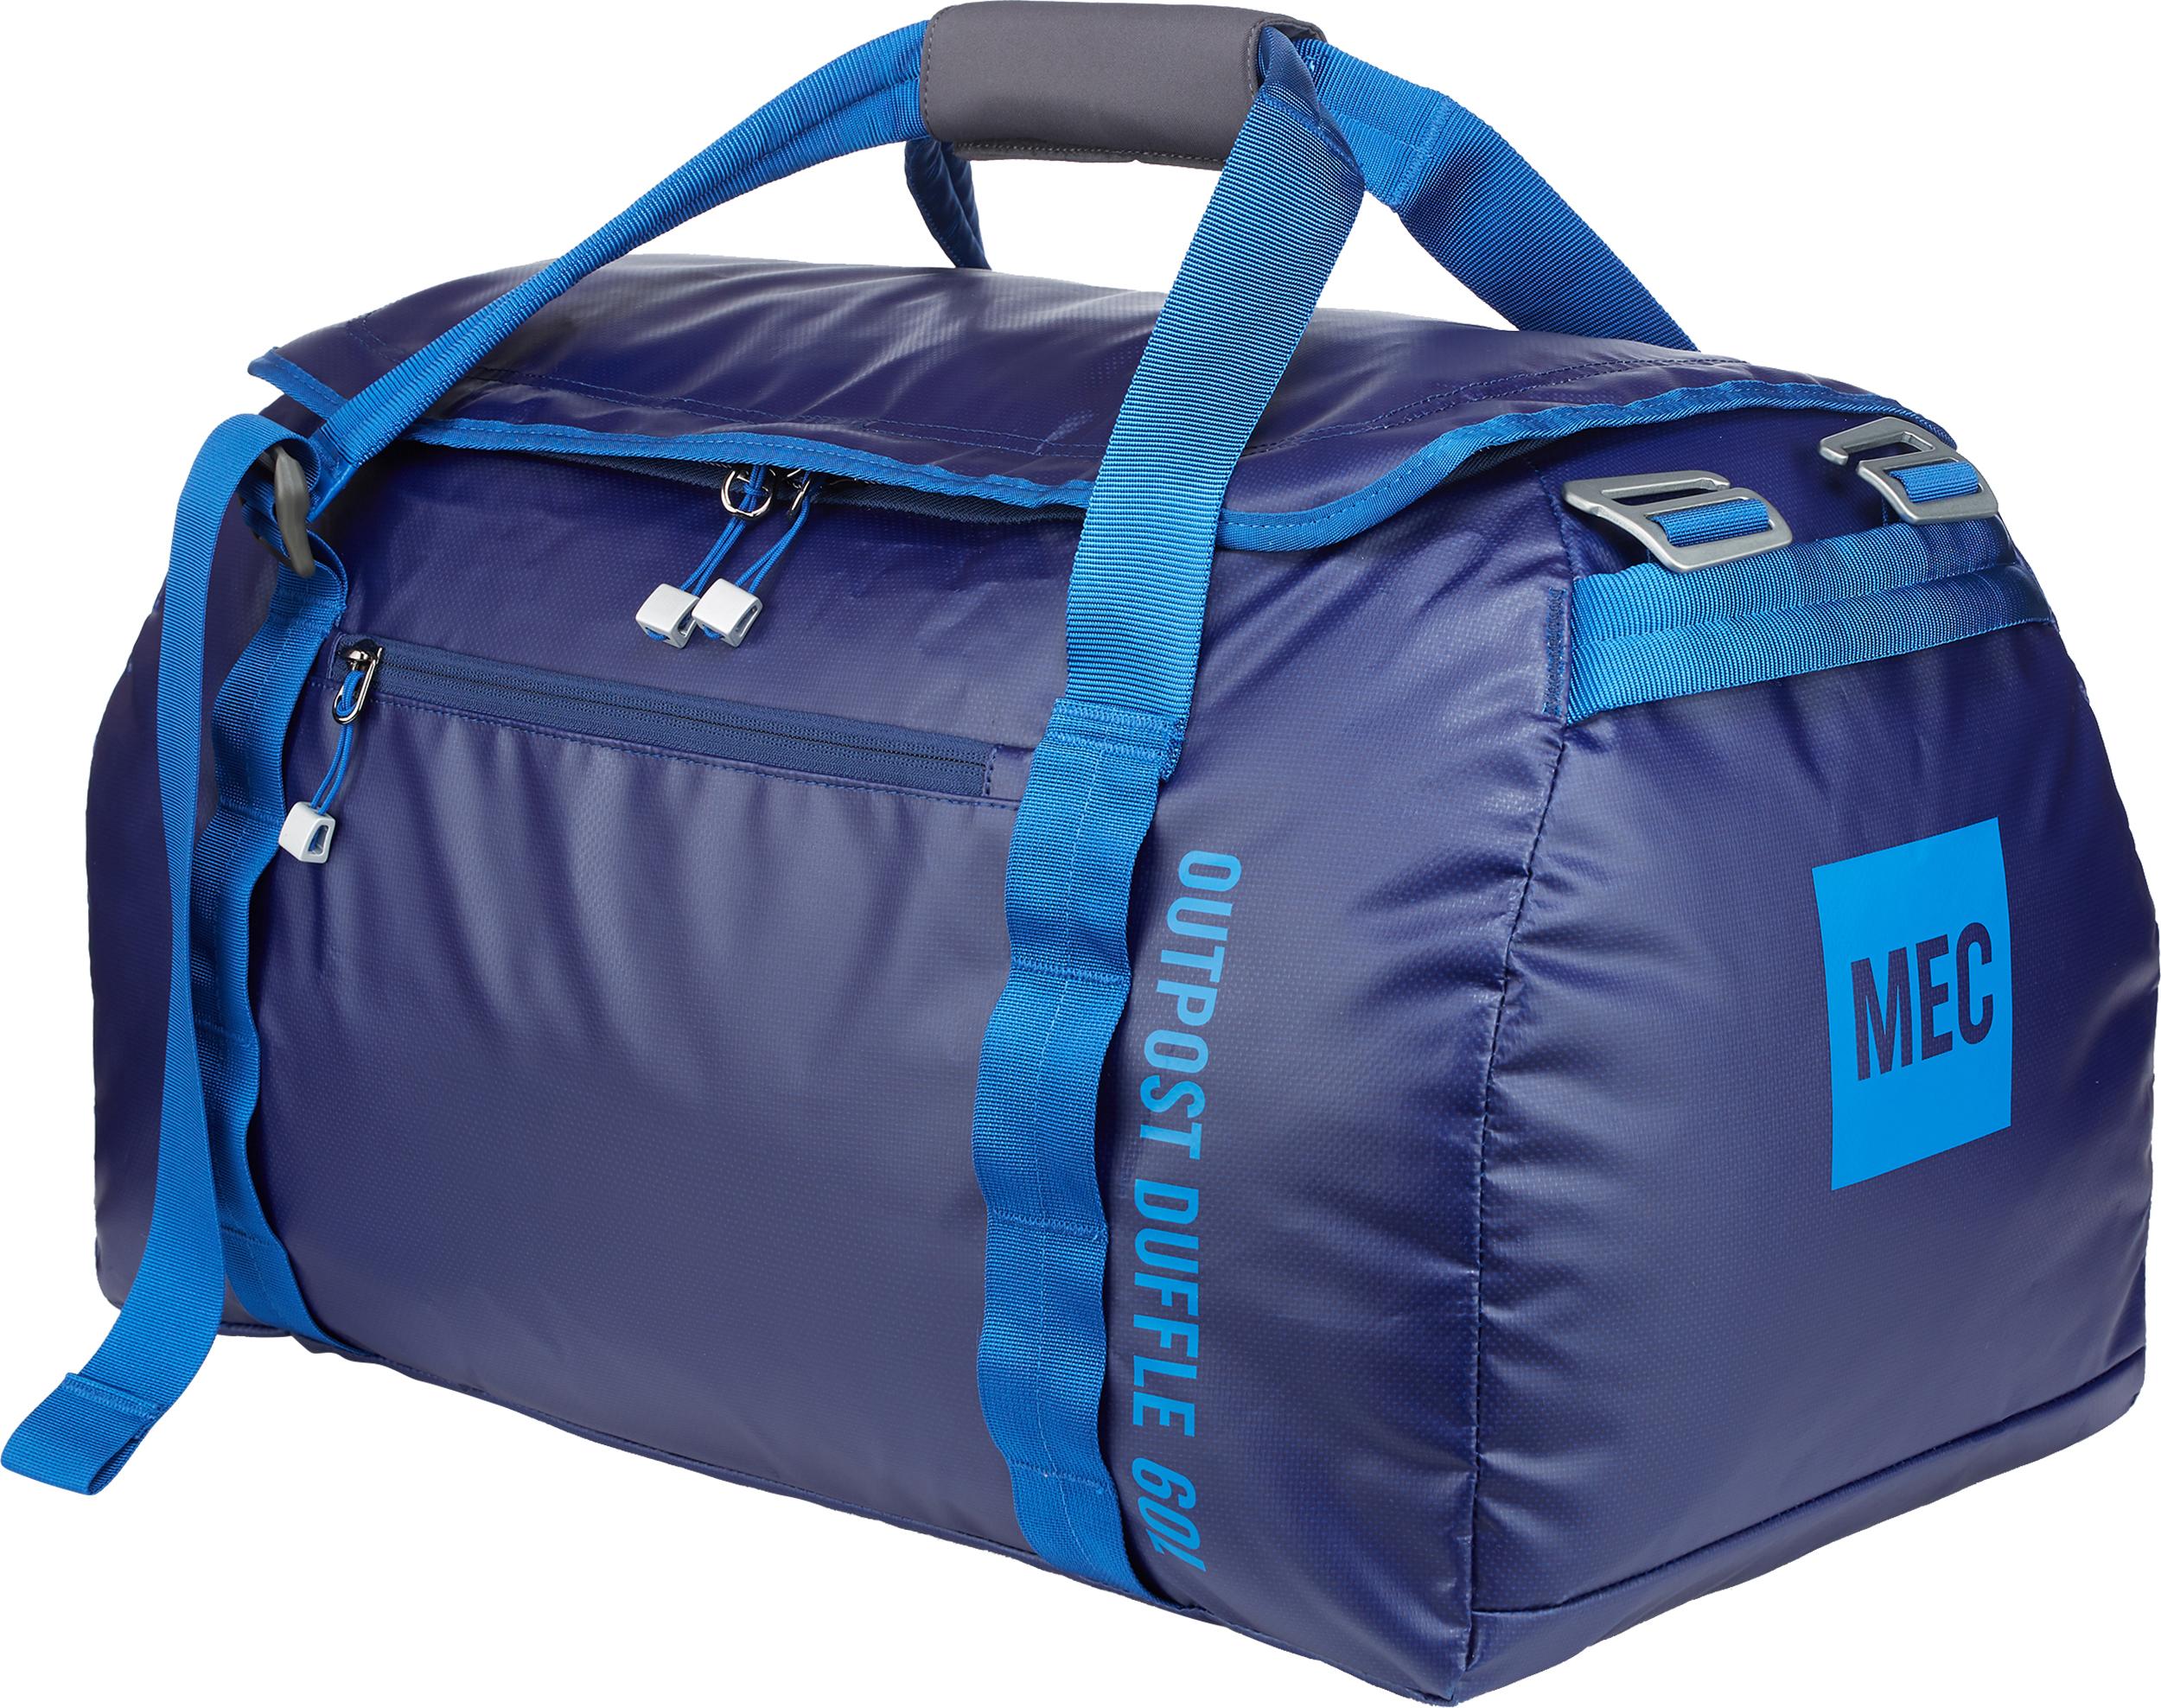 0a0026c253 Duffle bags